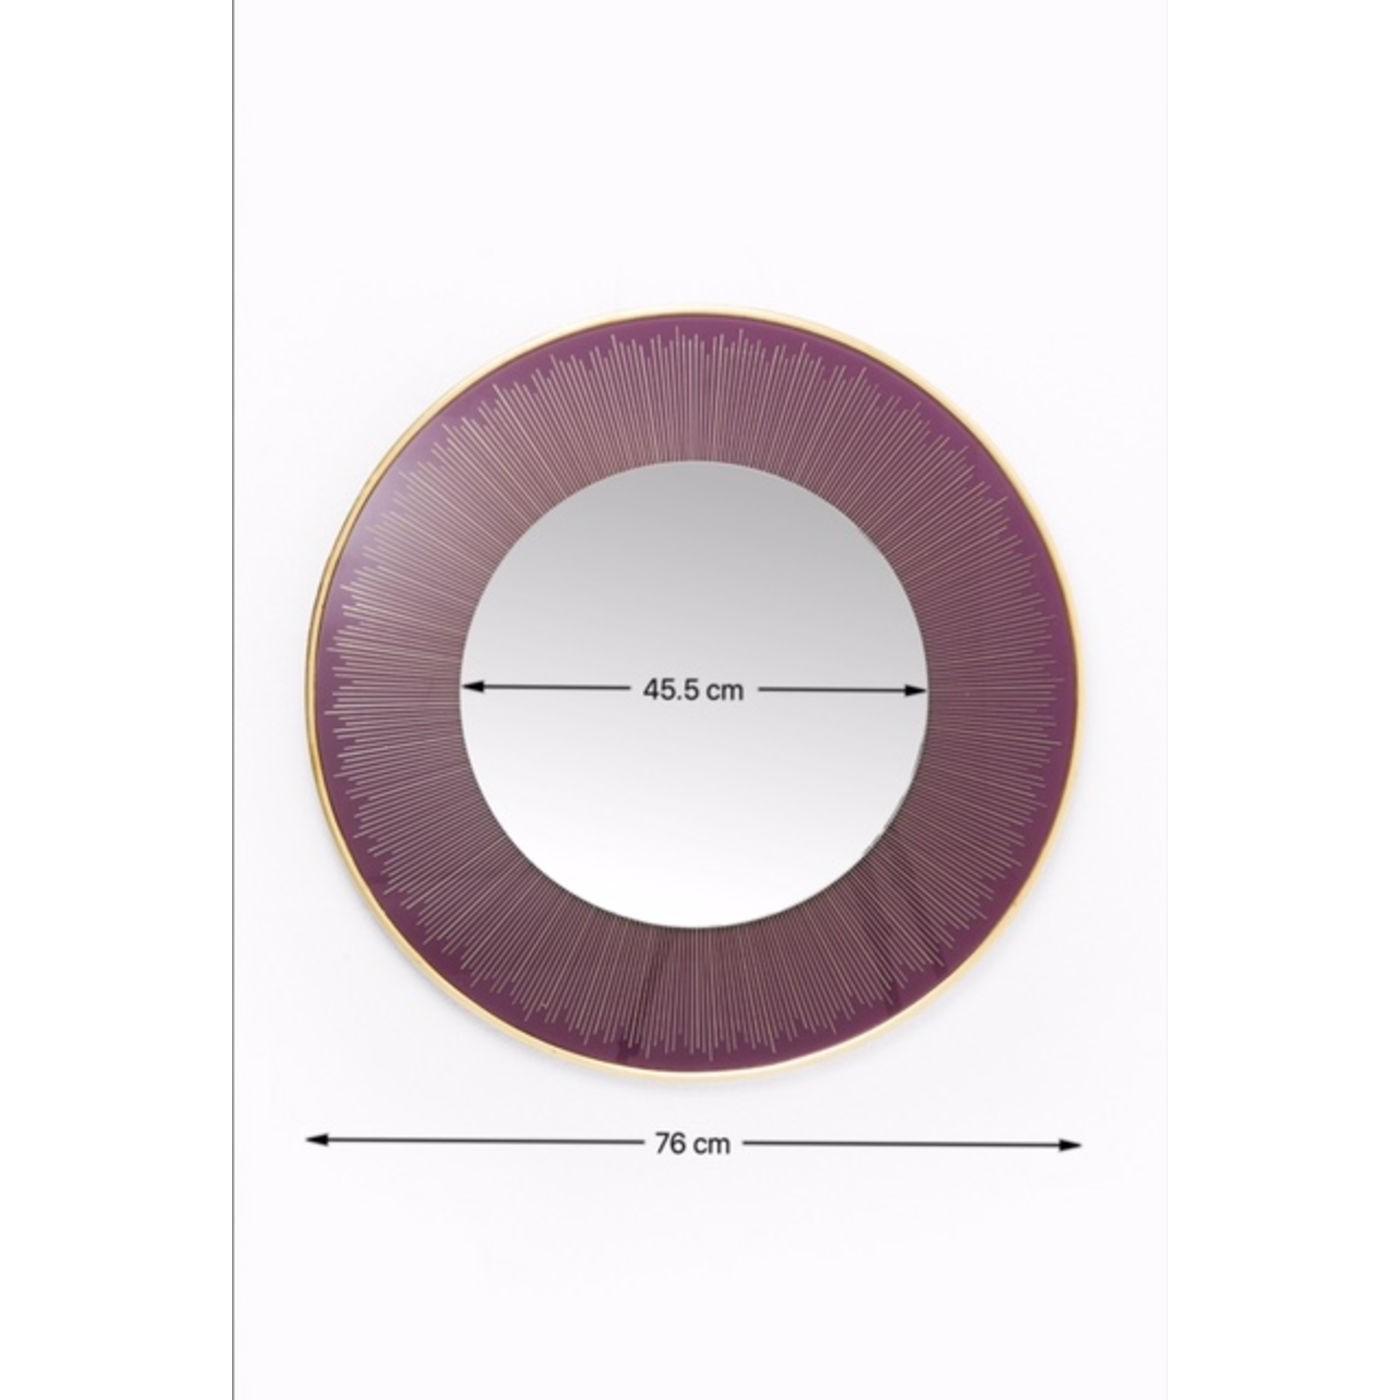 Miroir rond Revival violet 76cm Kare Design